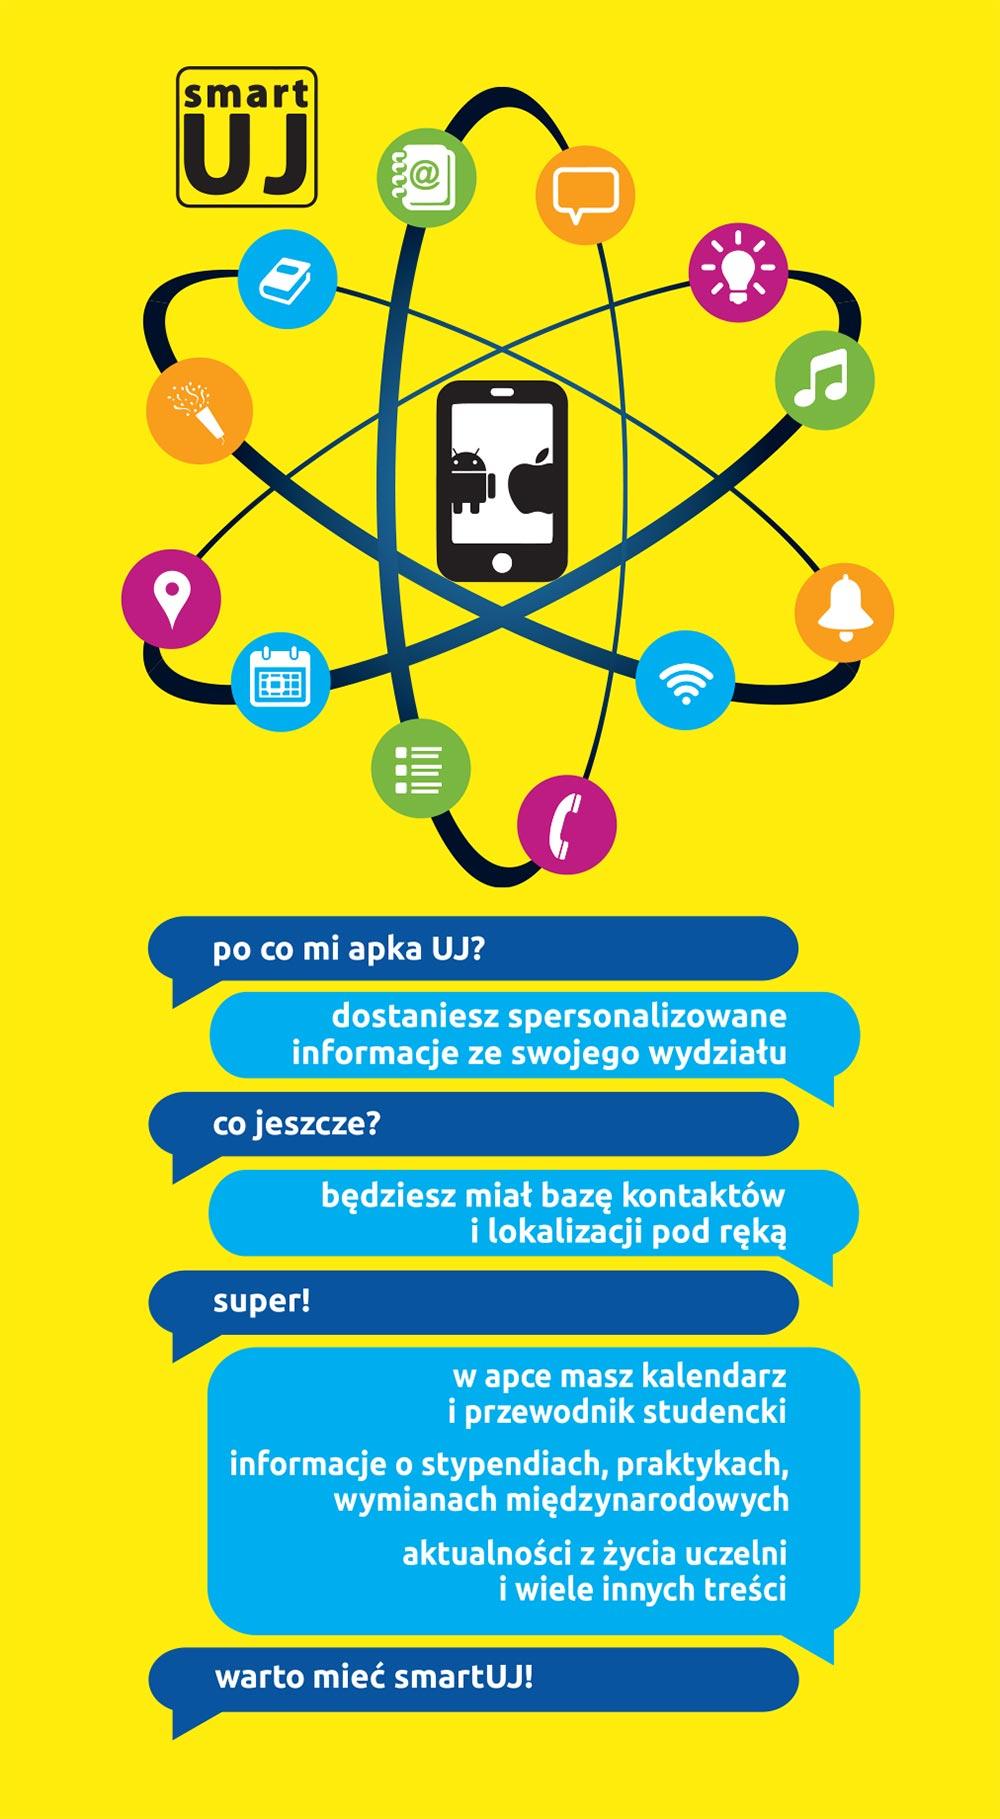 aplikacja mobilna smartUJ